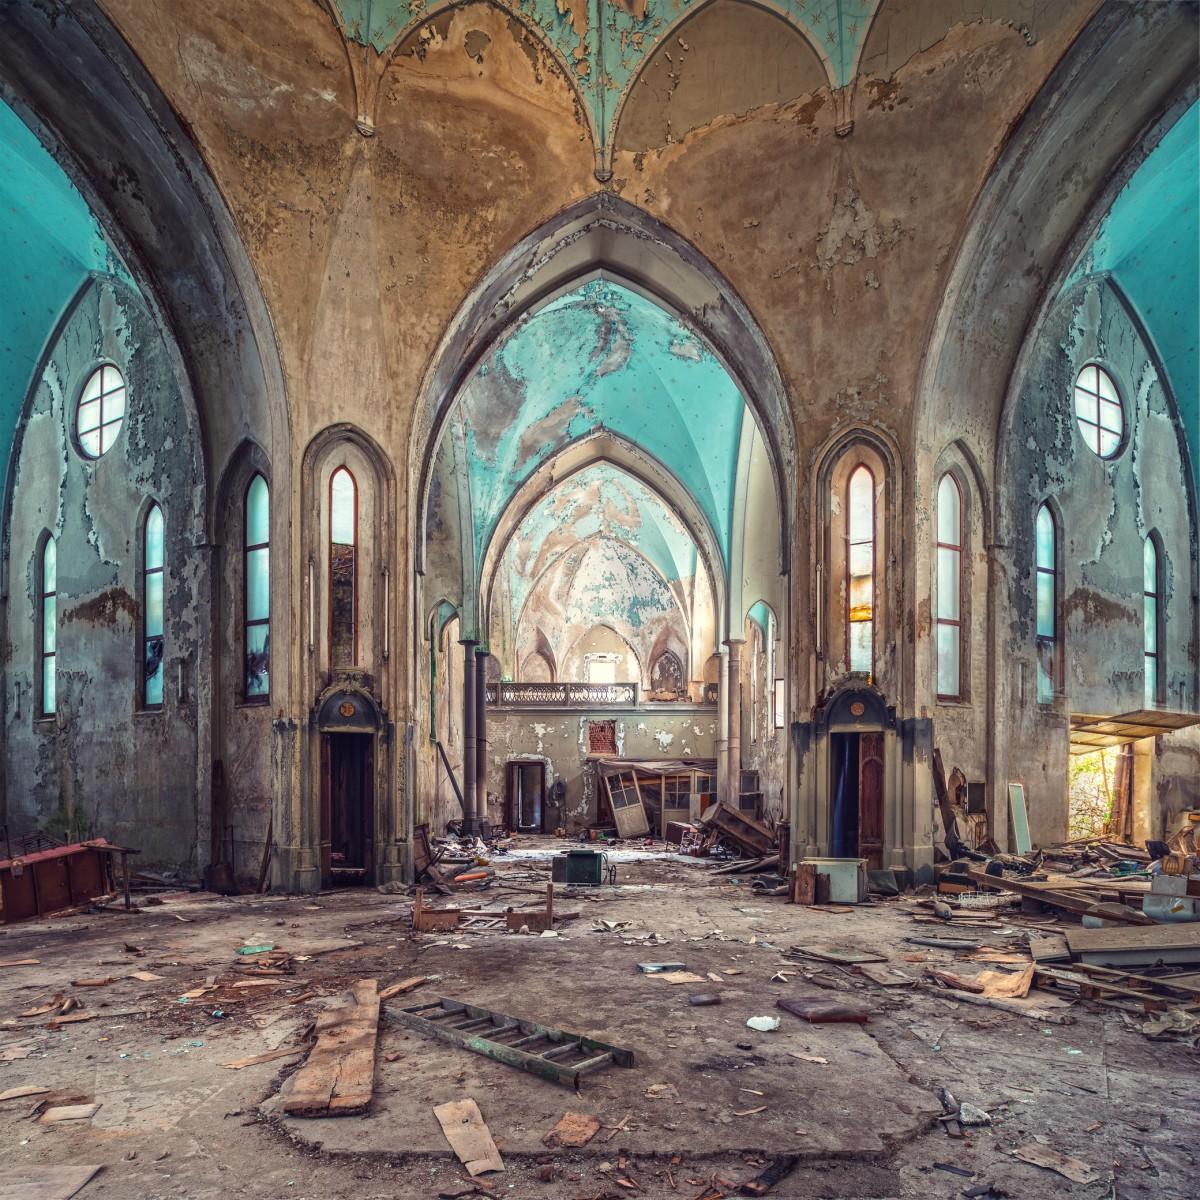 Chiesa Turchese, Interior Photography